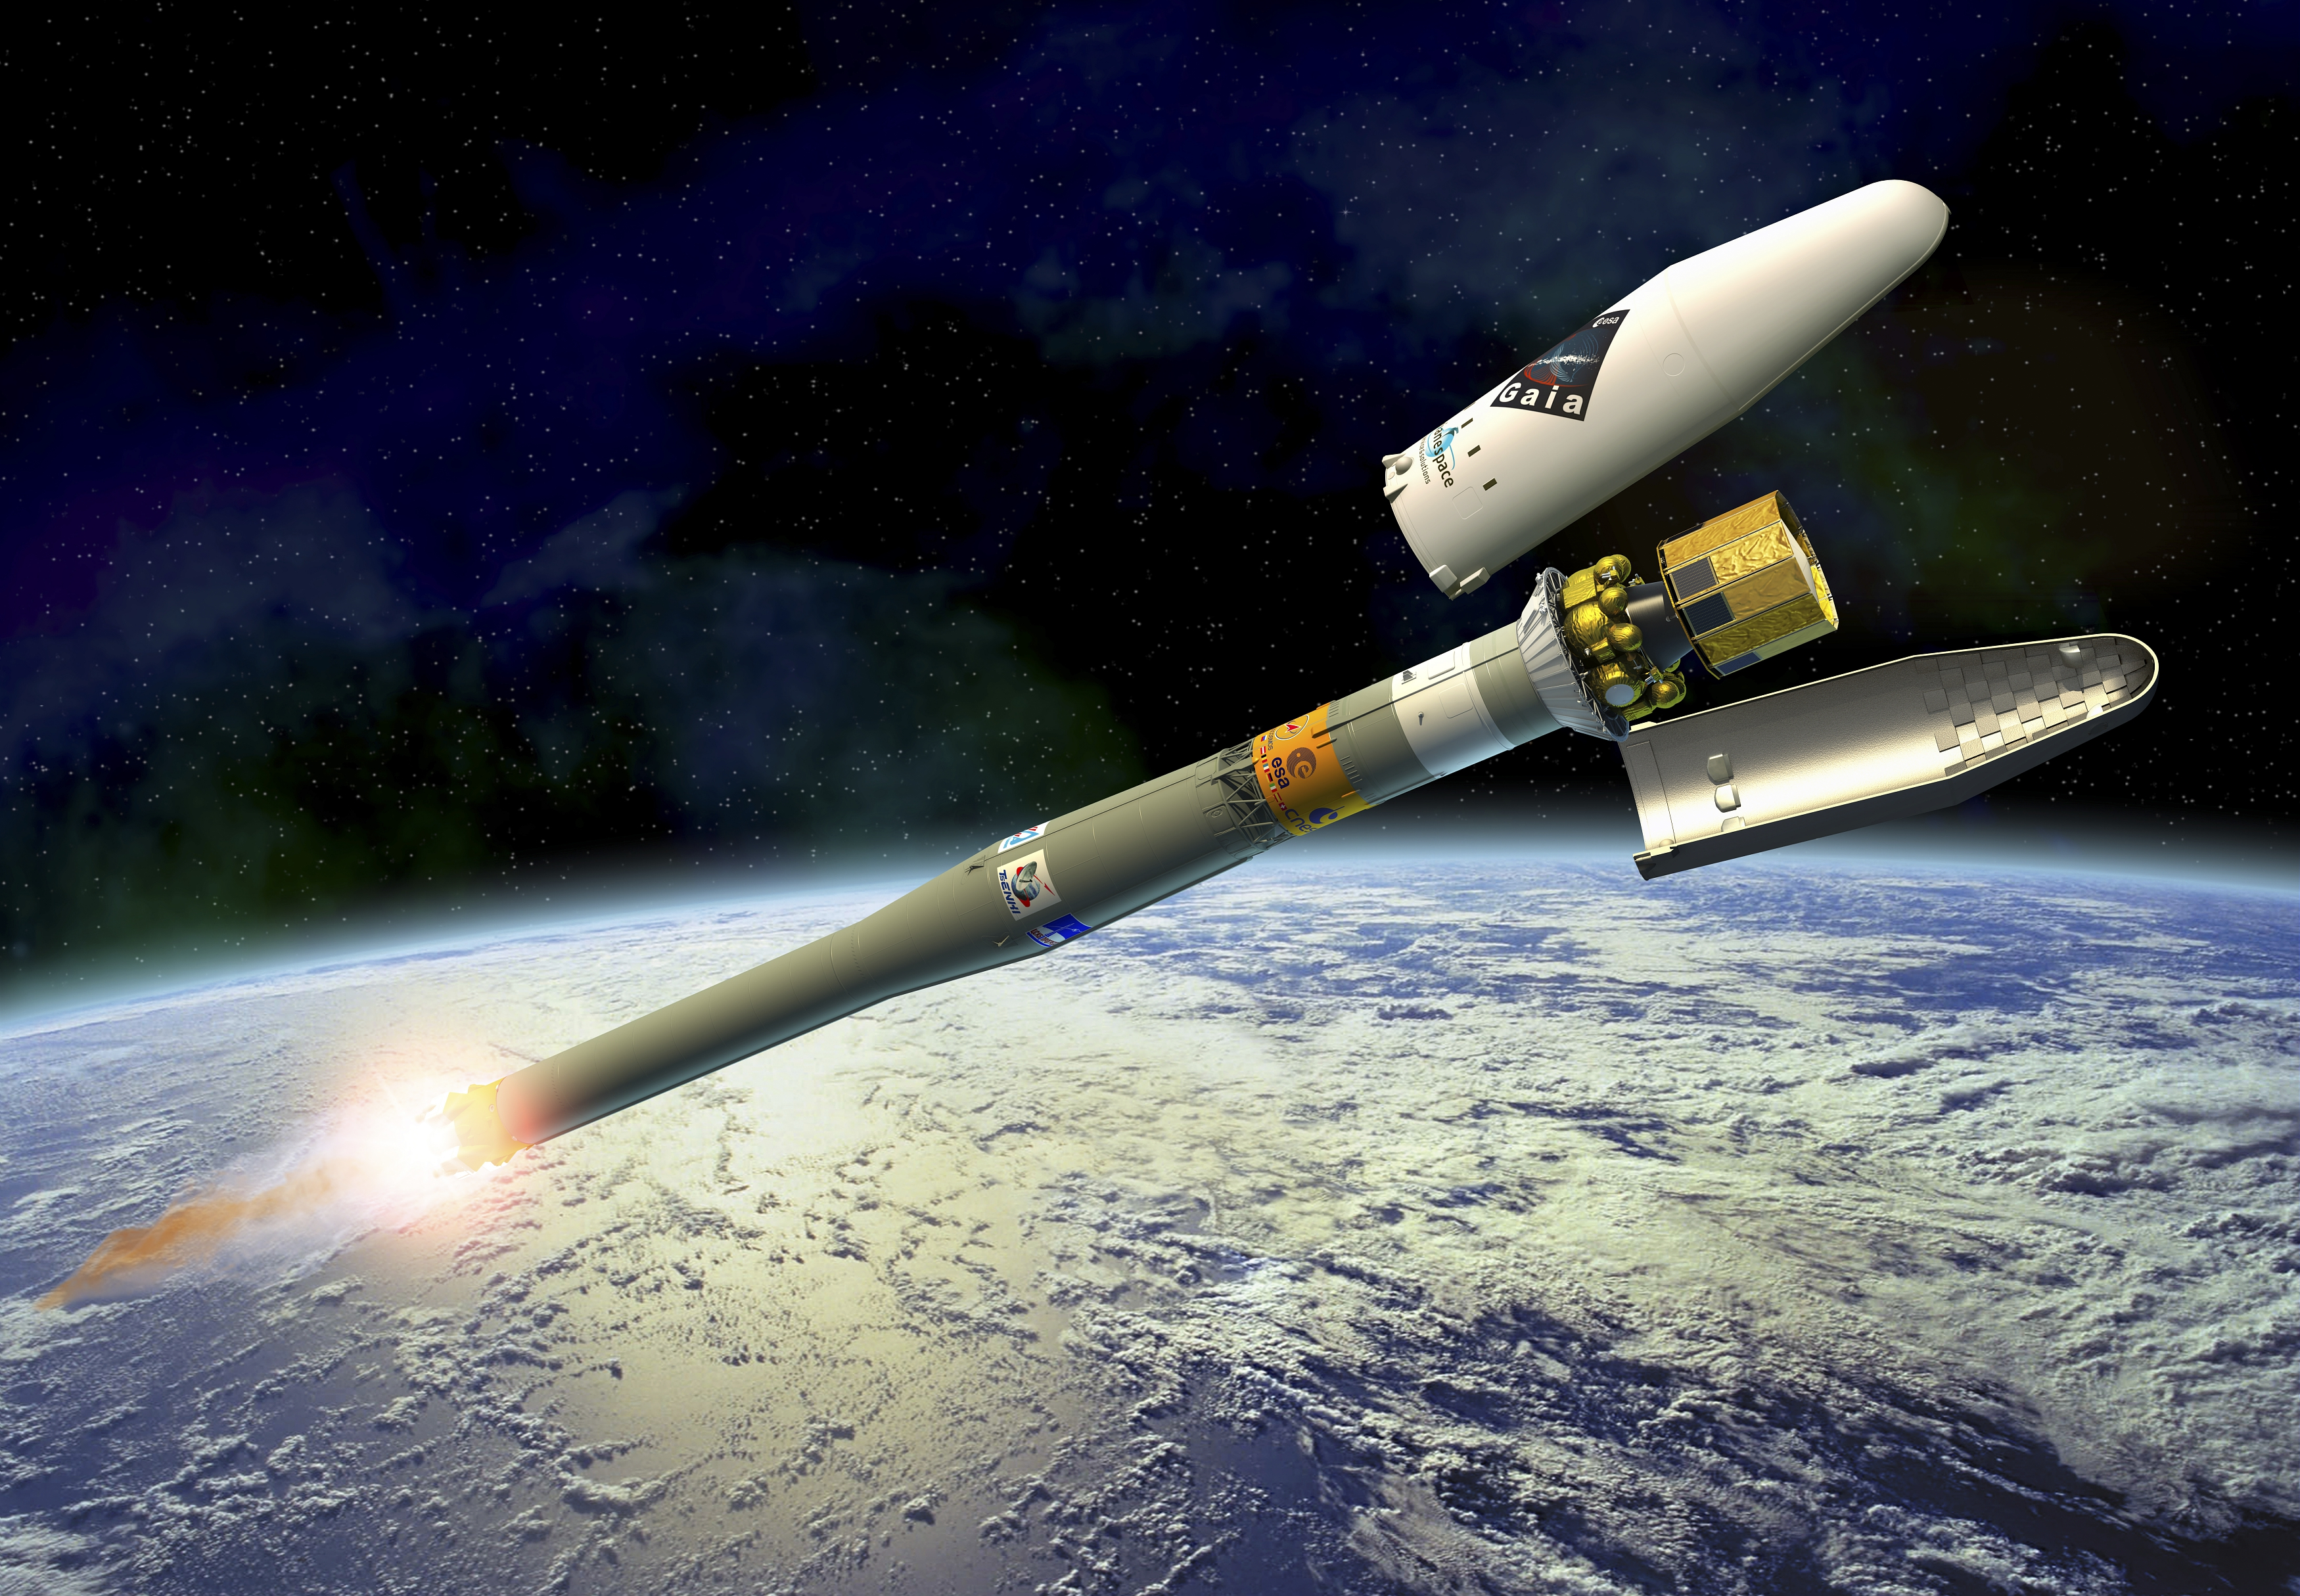 gaia spacecraft mission - photo #22